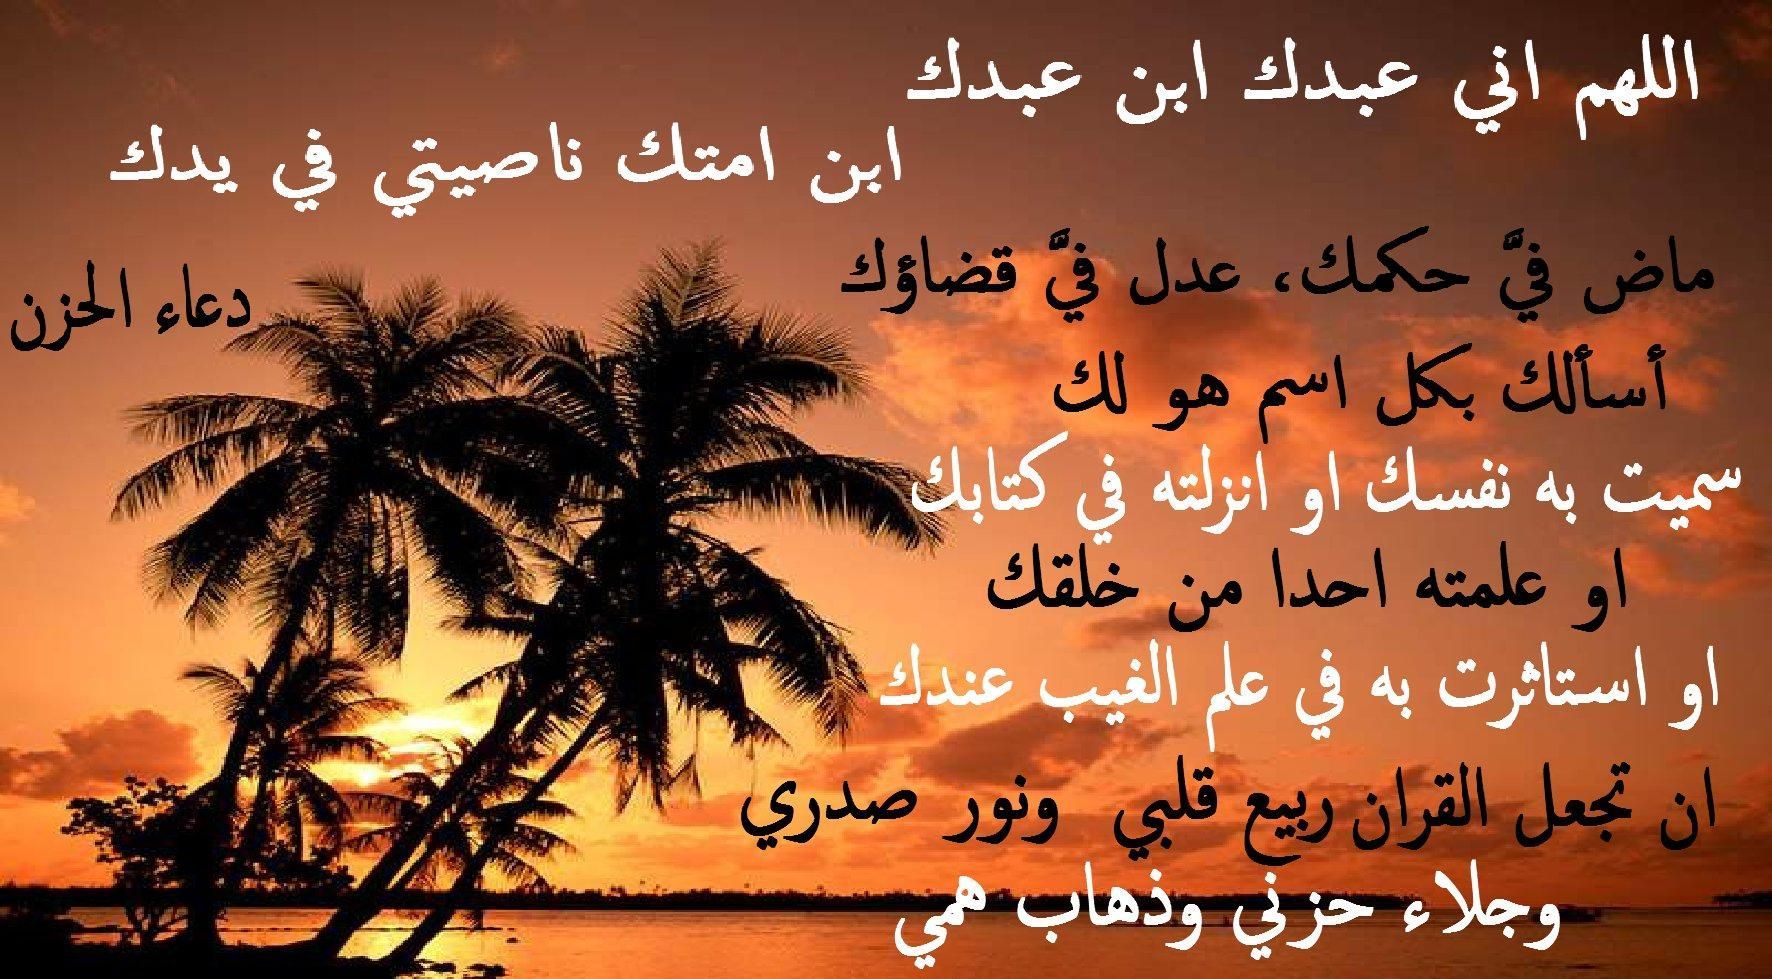 Https Islamic Images Org صور اسلامية مكتوبة فعلا جميله جدا والن Http Islamic Images Org Islamic Images Poster Sal